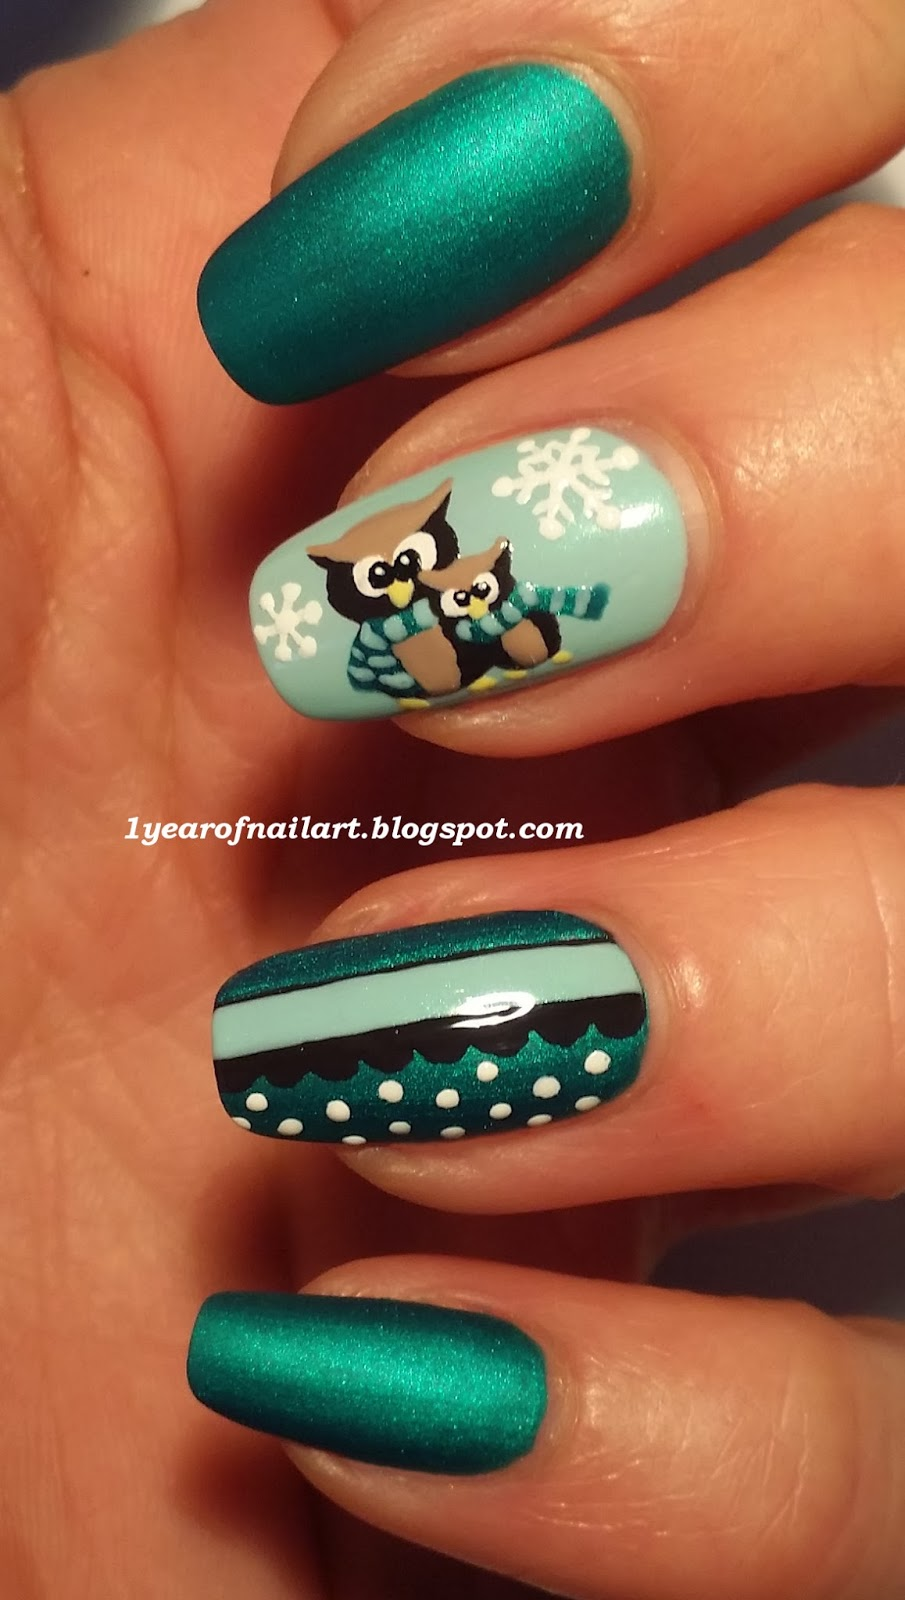 365+ days of nail art: Cute owls nail art (winter themed)